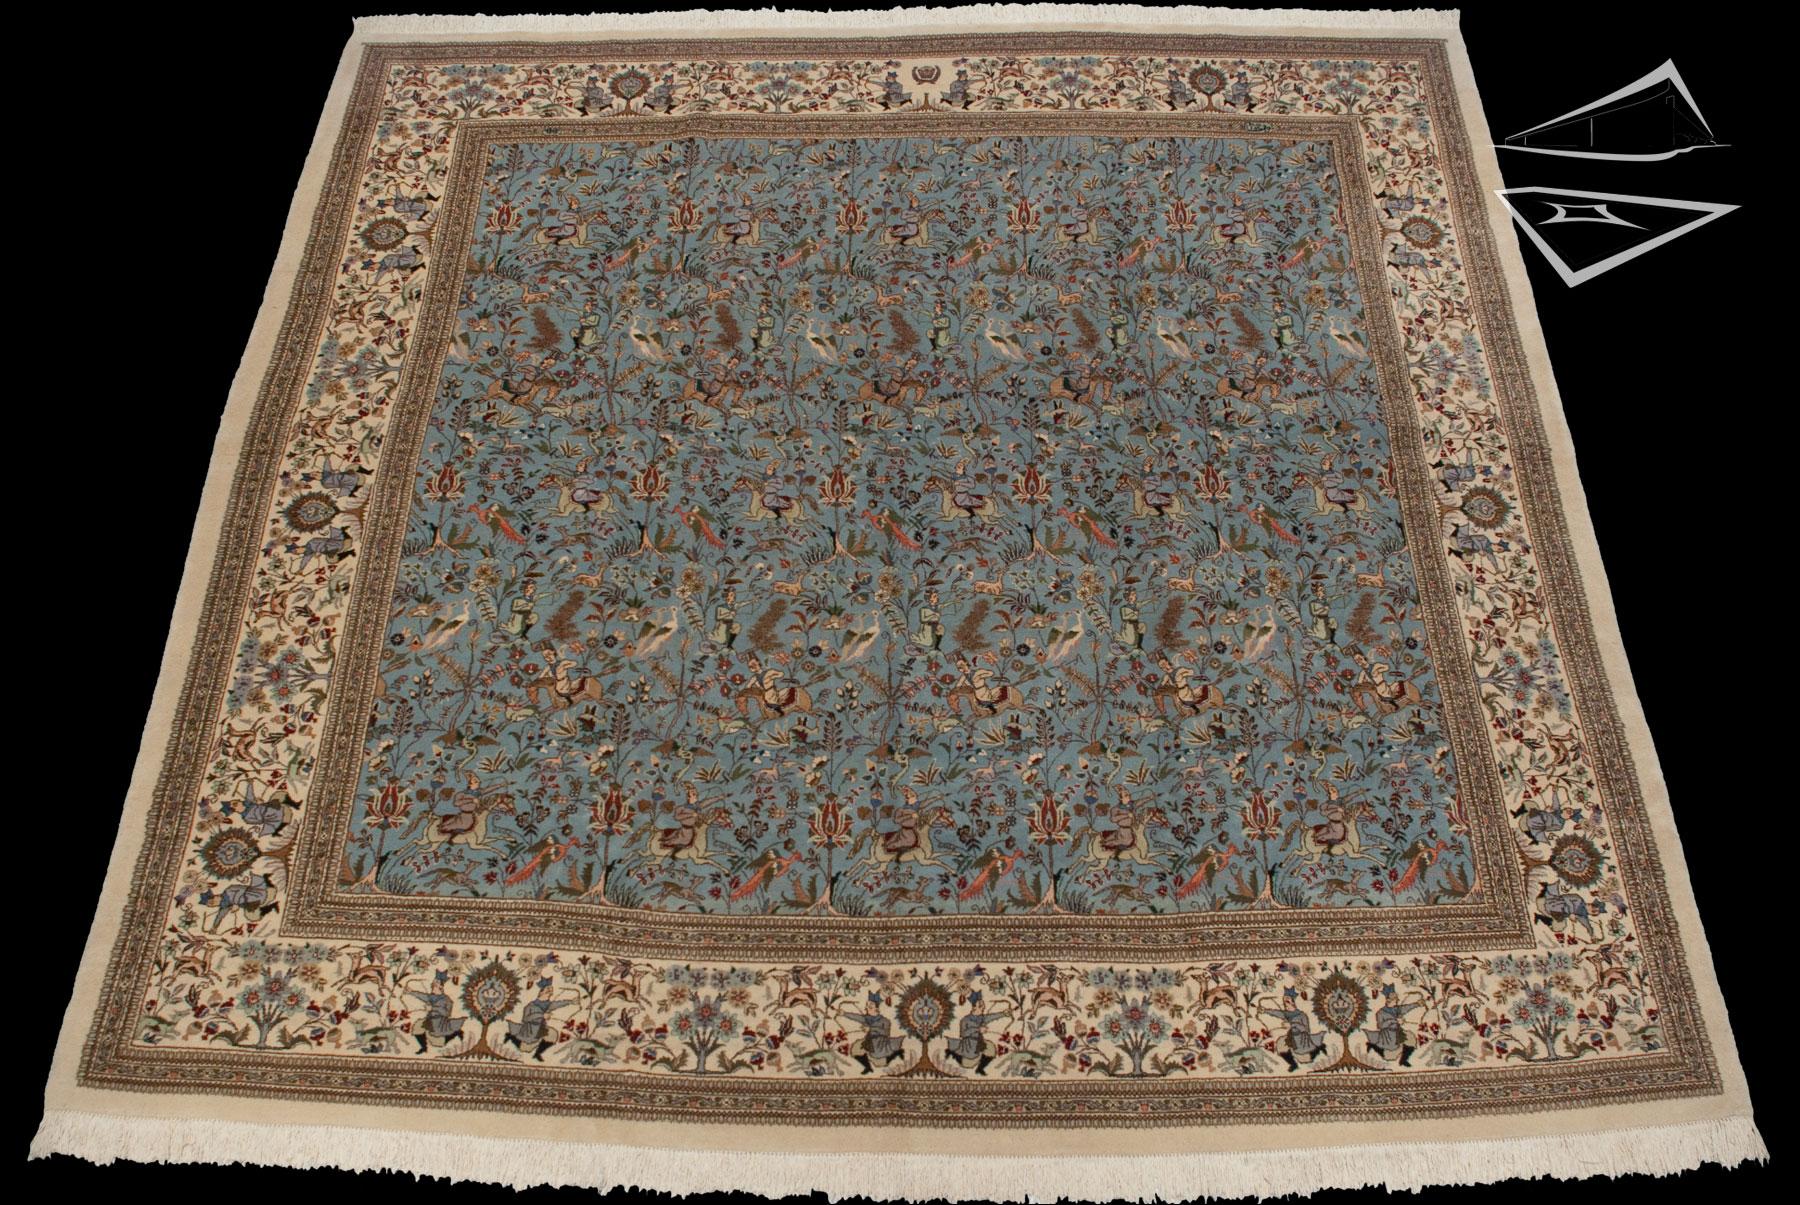 Square Persian Cyrus Crown Tabriz Rug 12 x 12